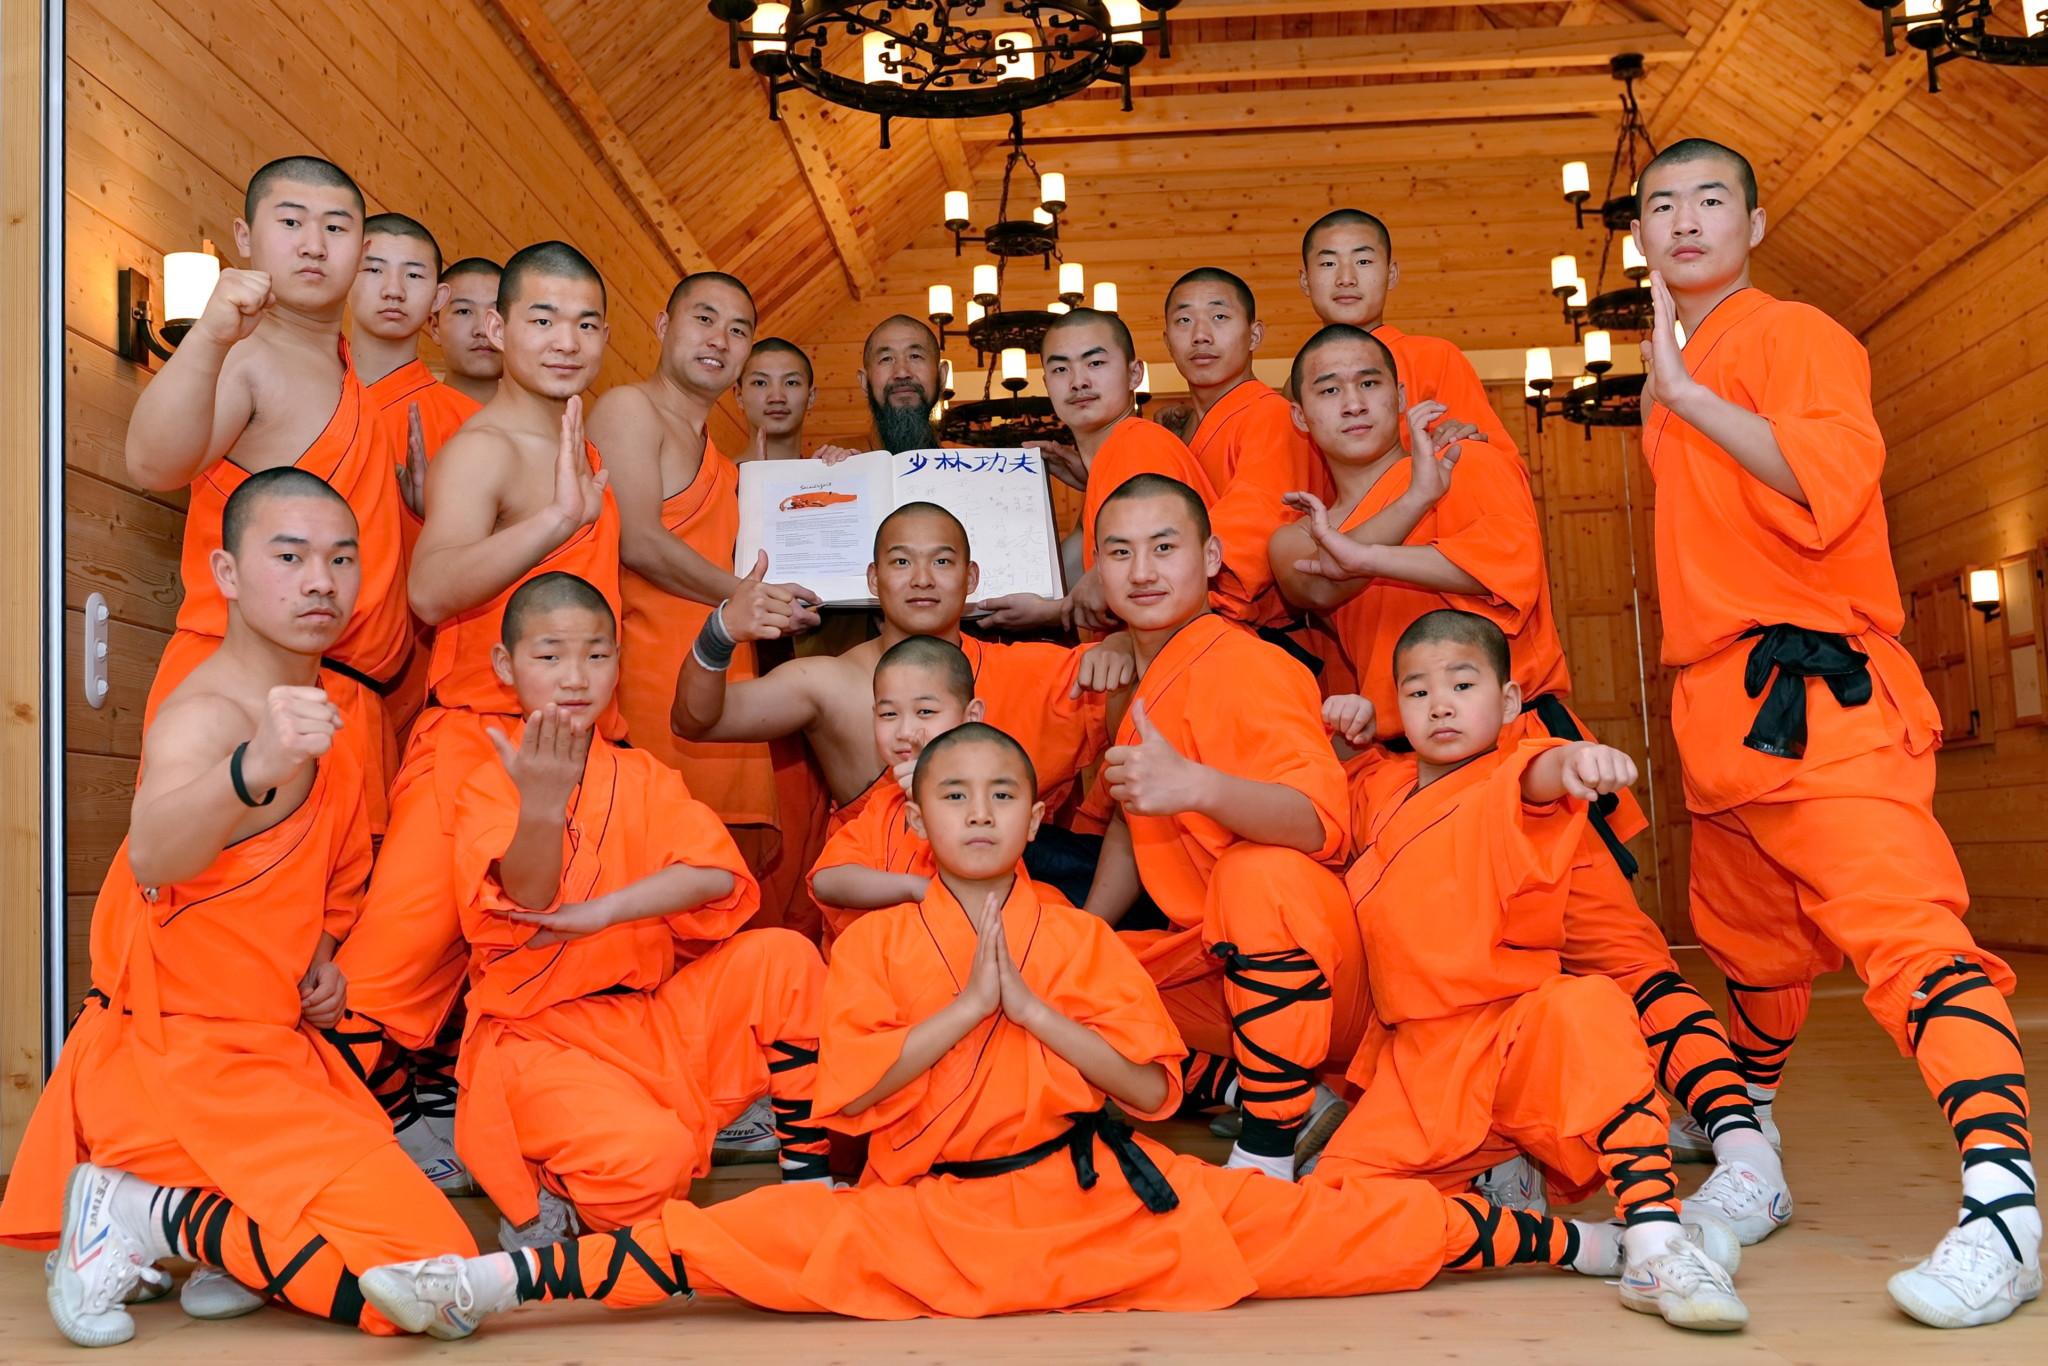 Shaolin Moenche_0254_1